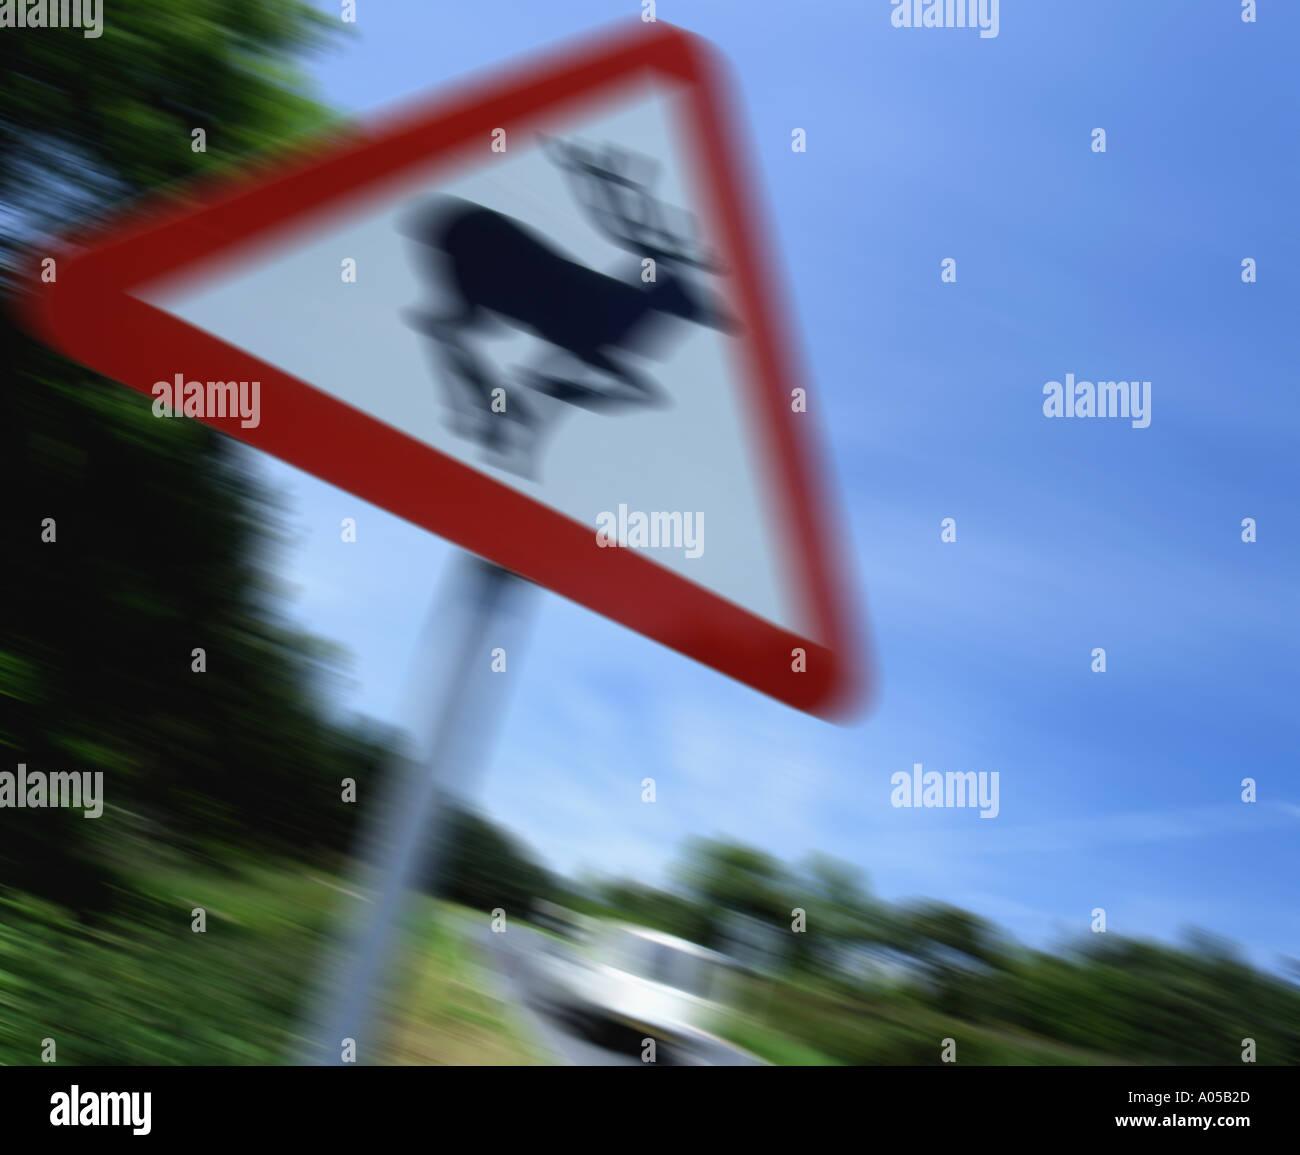 Roadside deer warning - Stock Image